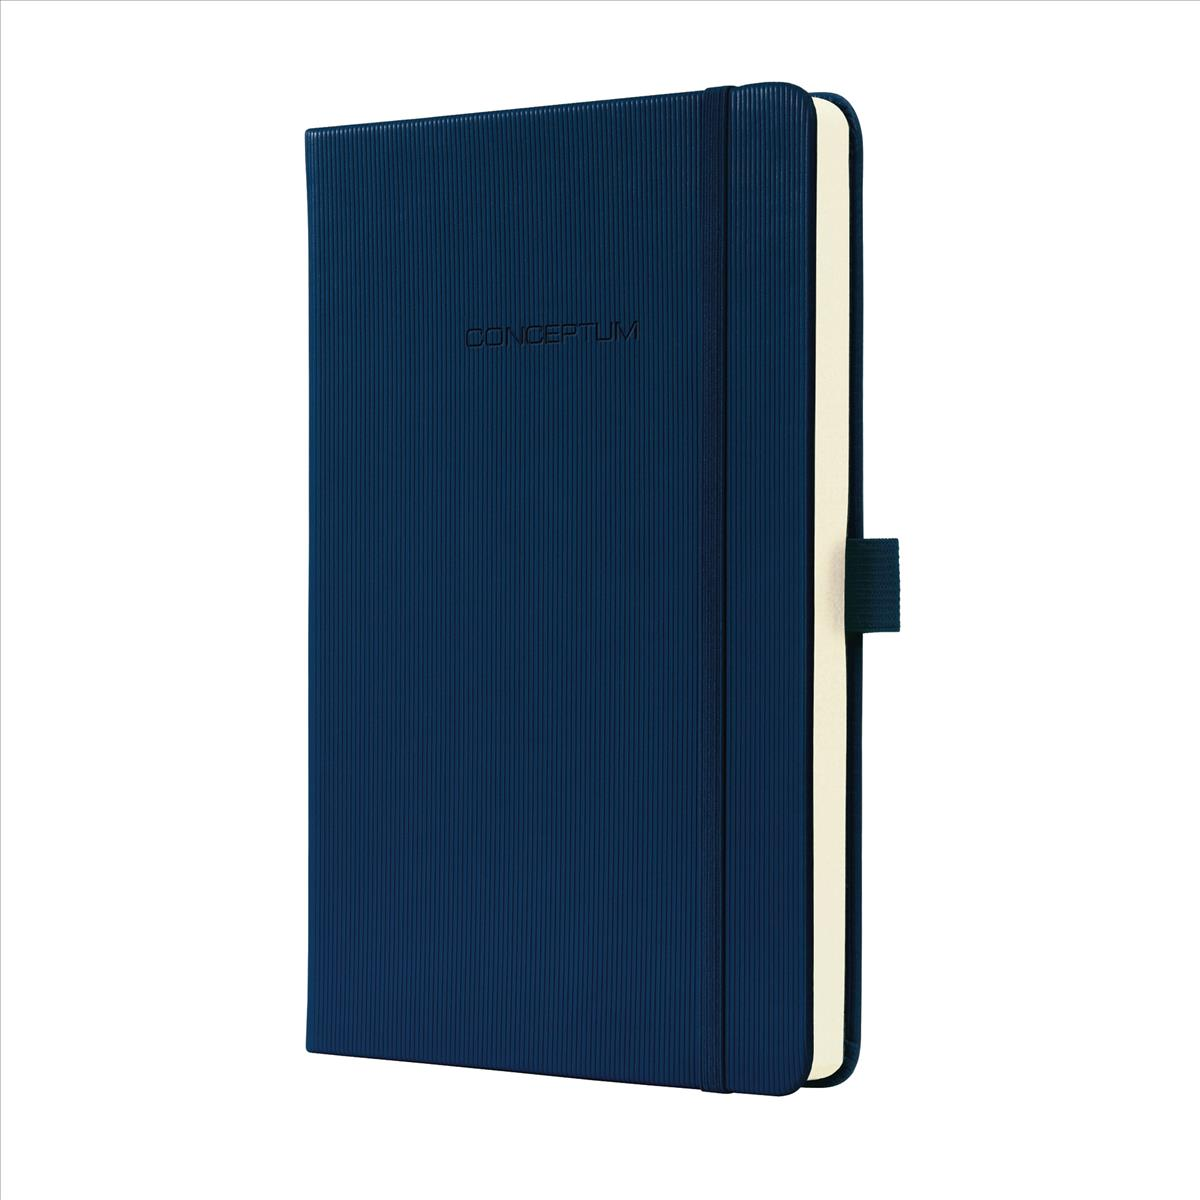 Sigel Conceptum Notebook Hard Cover 80gsm Ruled 194pp A5 Blue Ref C0577